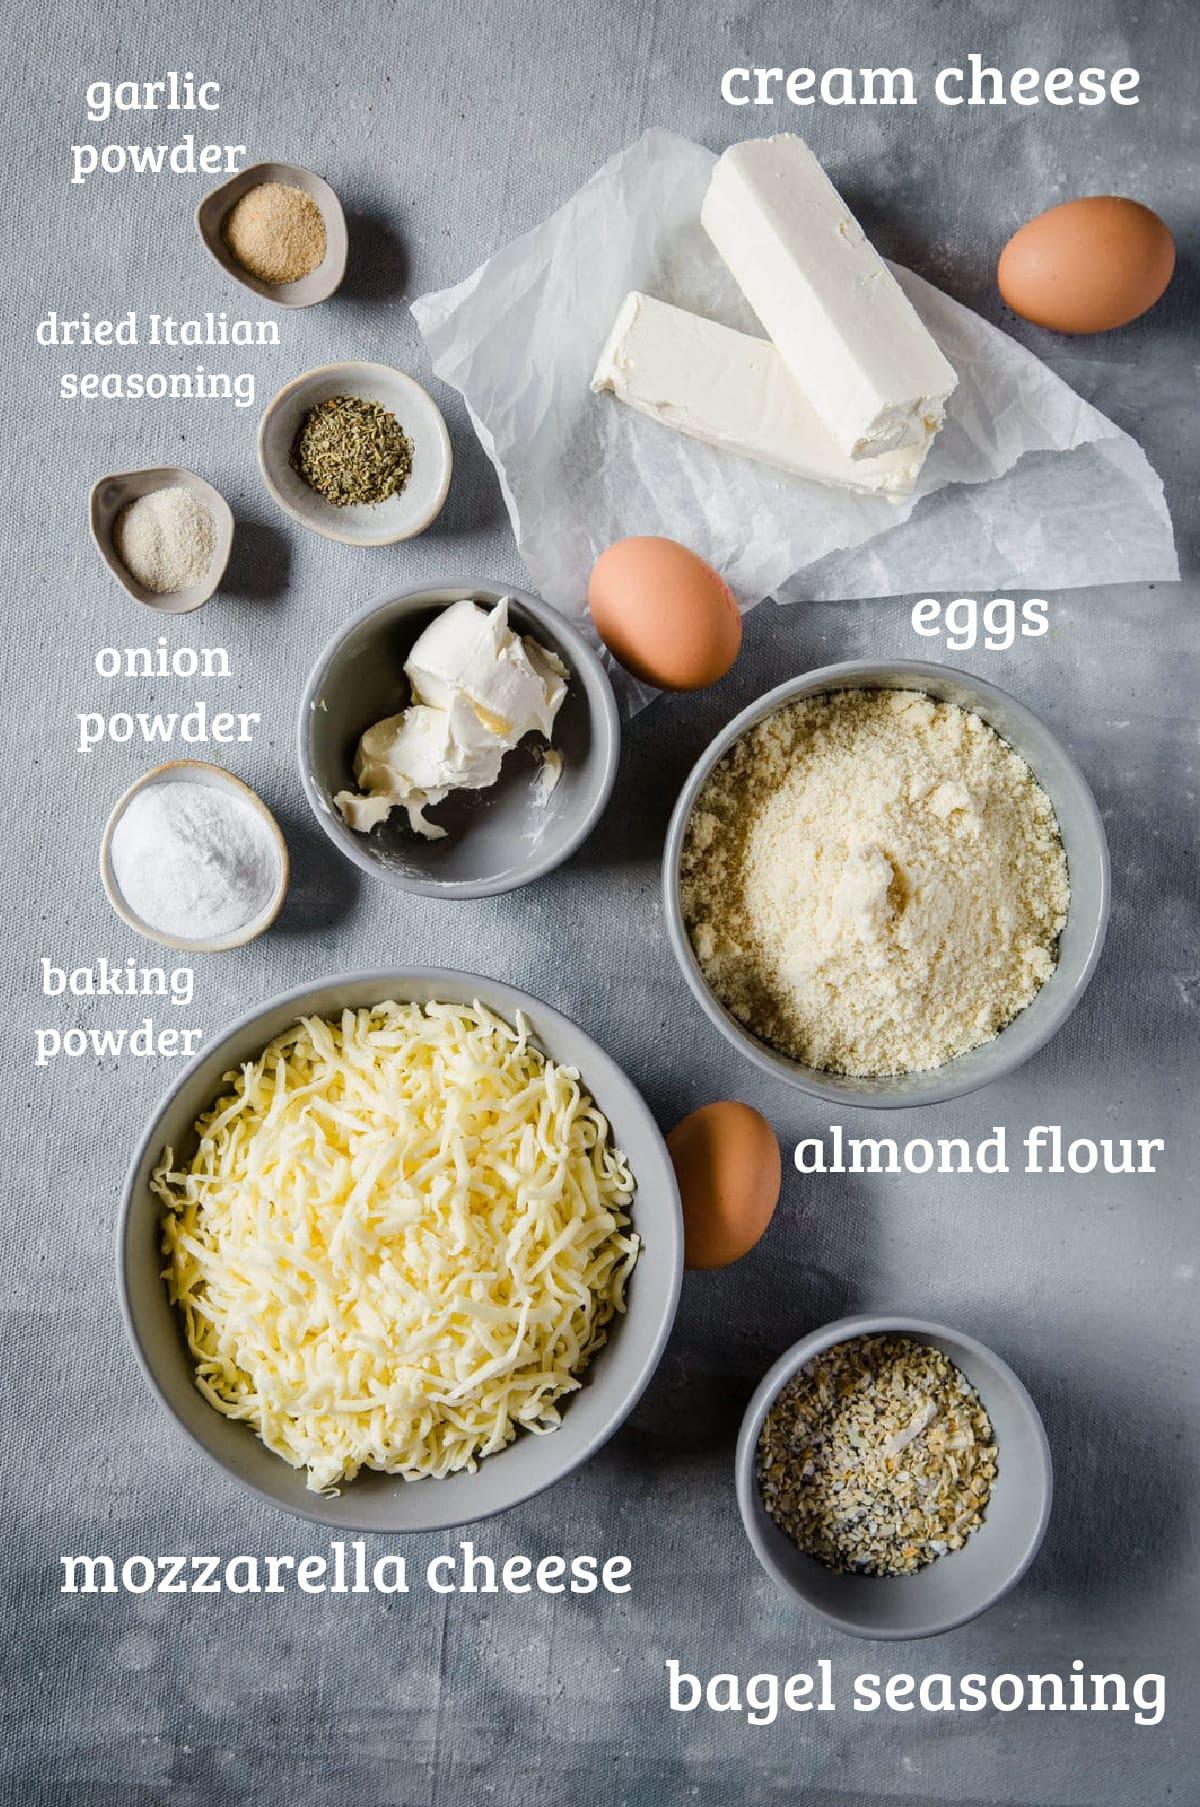 recipe ingredients for cream cheese stuffed everything bagel bites - cheese, almond flour, eggs, baking powder, seasonings